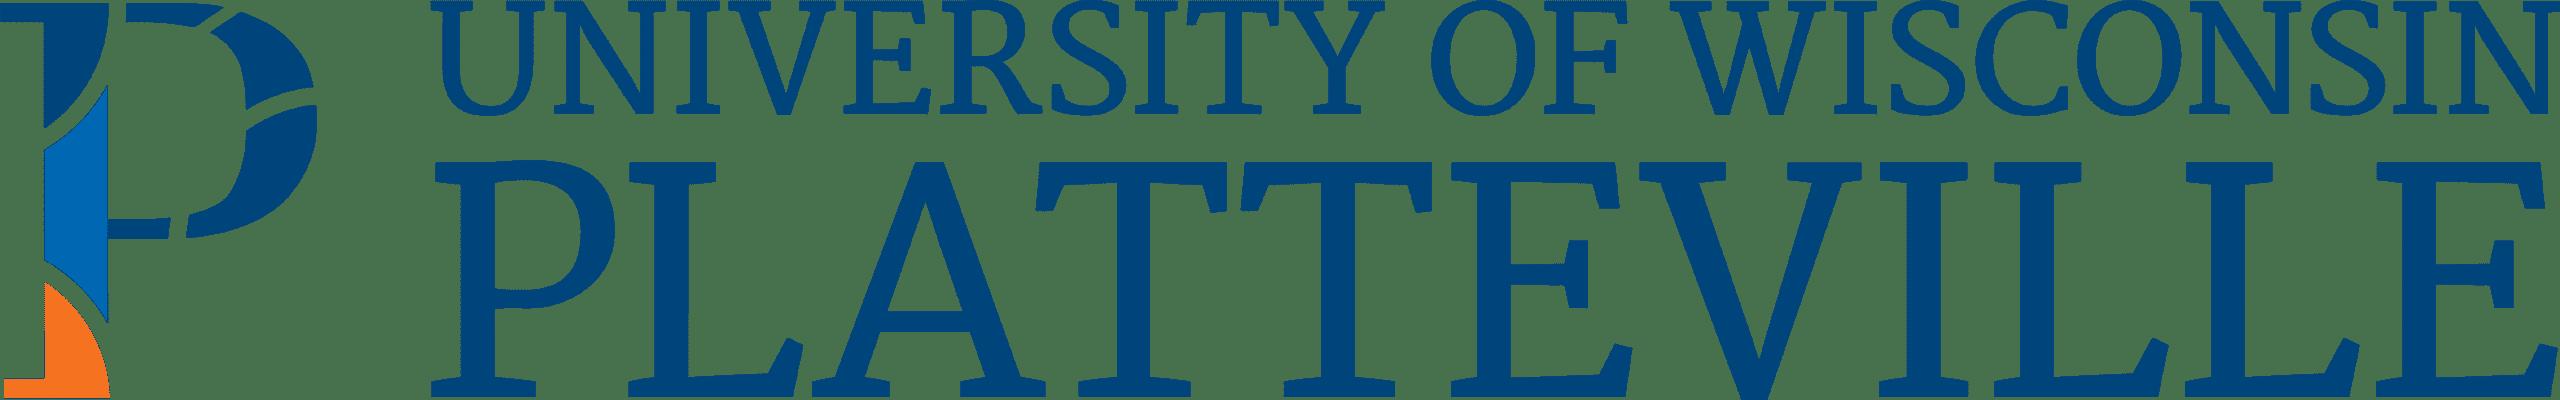 University of Wisconsin Platteville 4clr 1